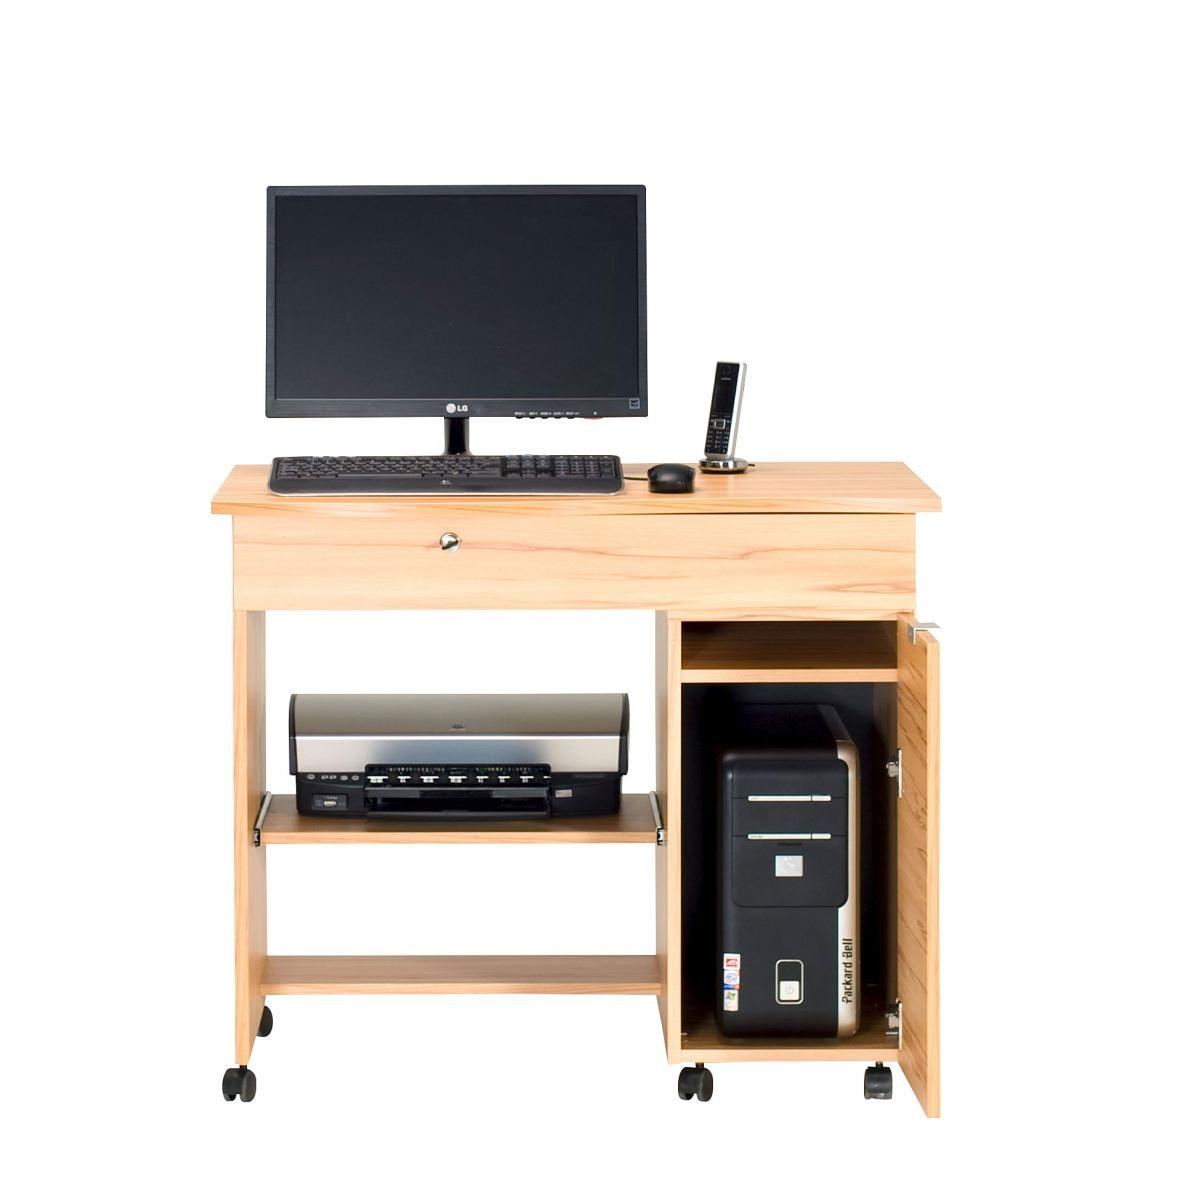 computertisch in kernbuche nachbildung | porta!, Gestaltungsideen